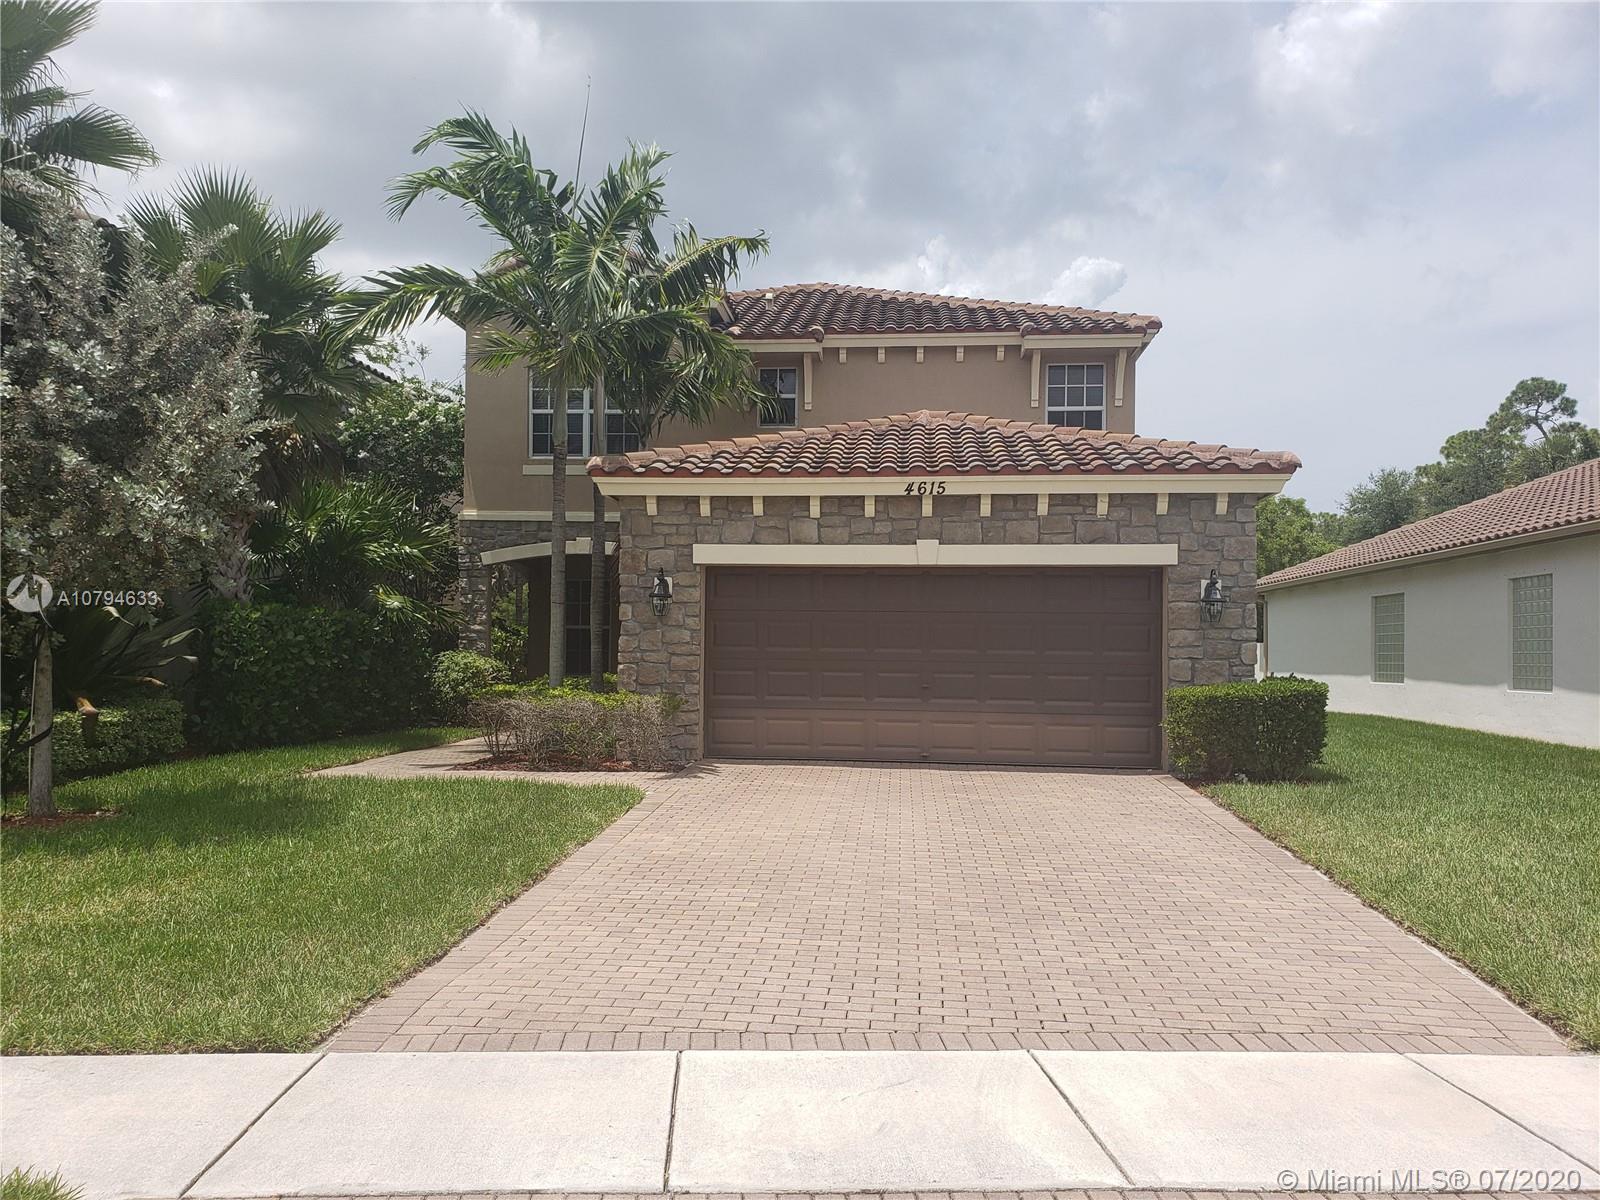 4615 Capital Dr, Lake Worth, FL 33463